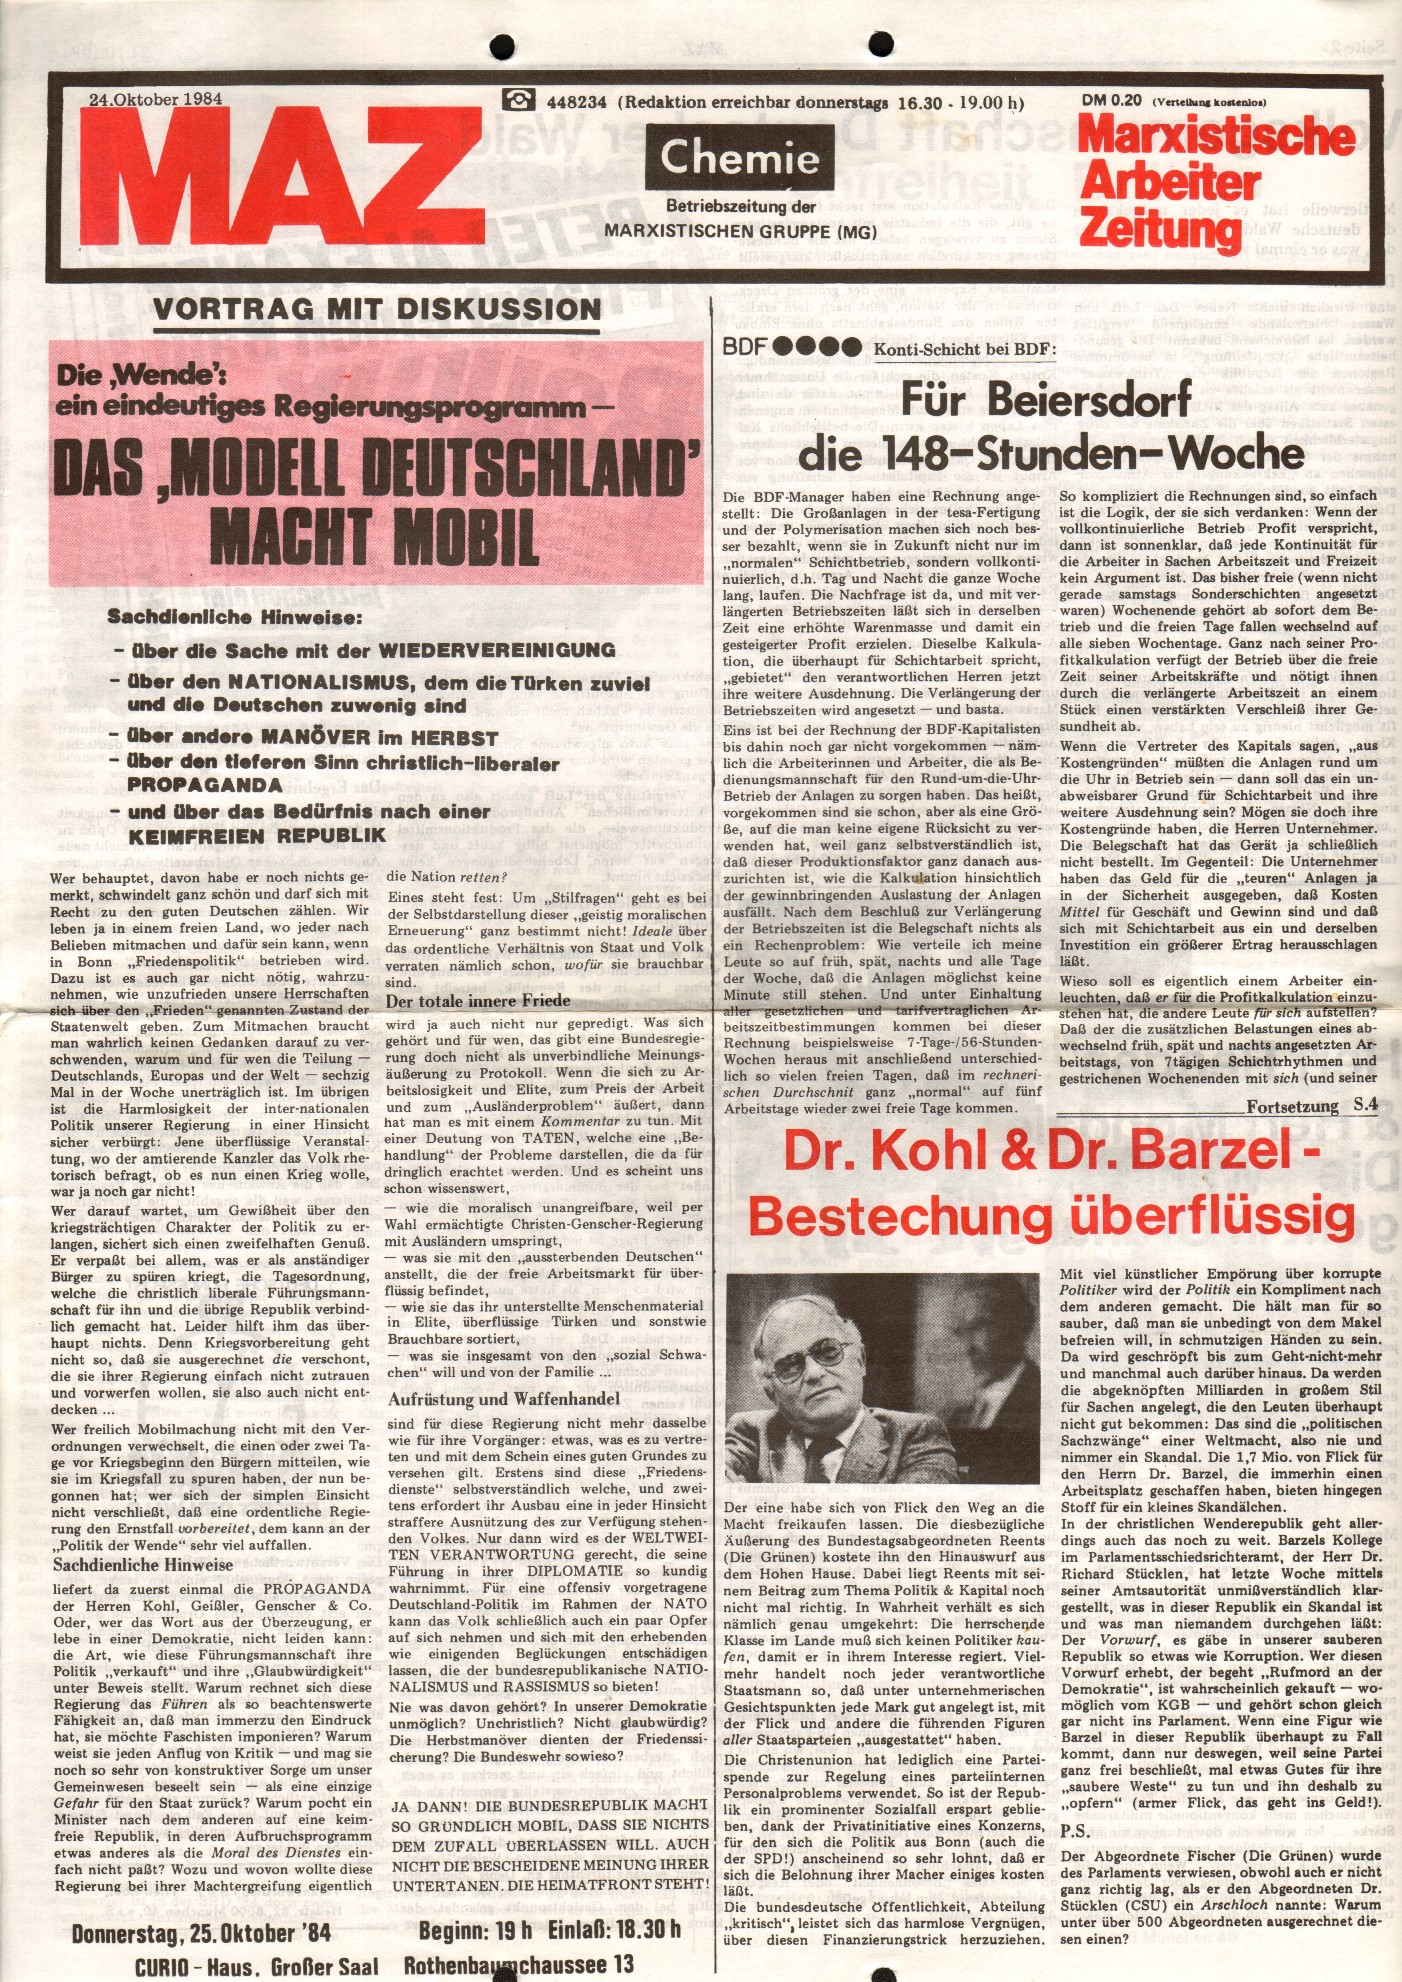 Hamburg_MG_MAZ_Chemie_19841024_01